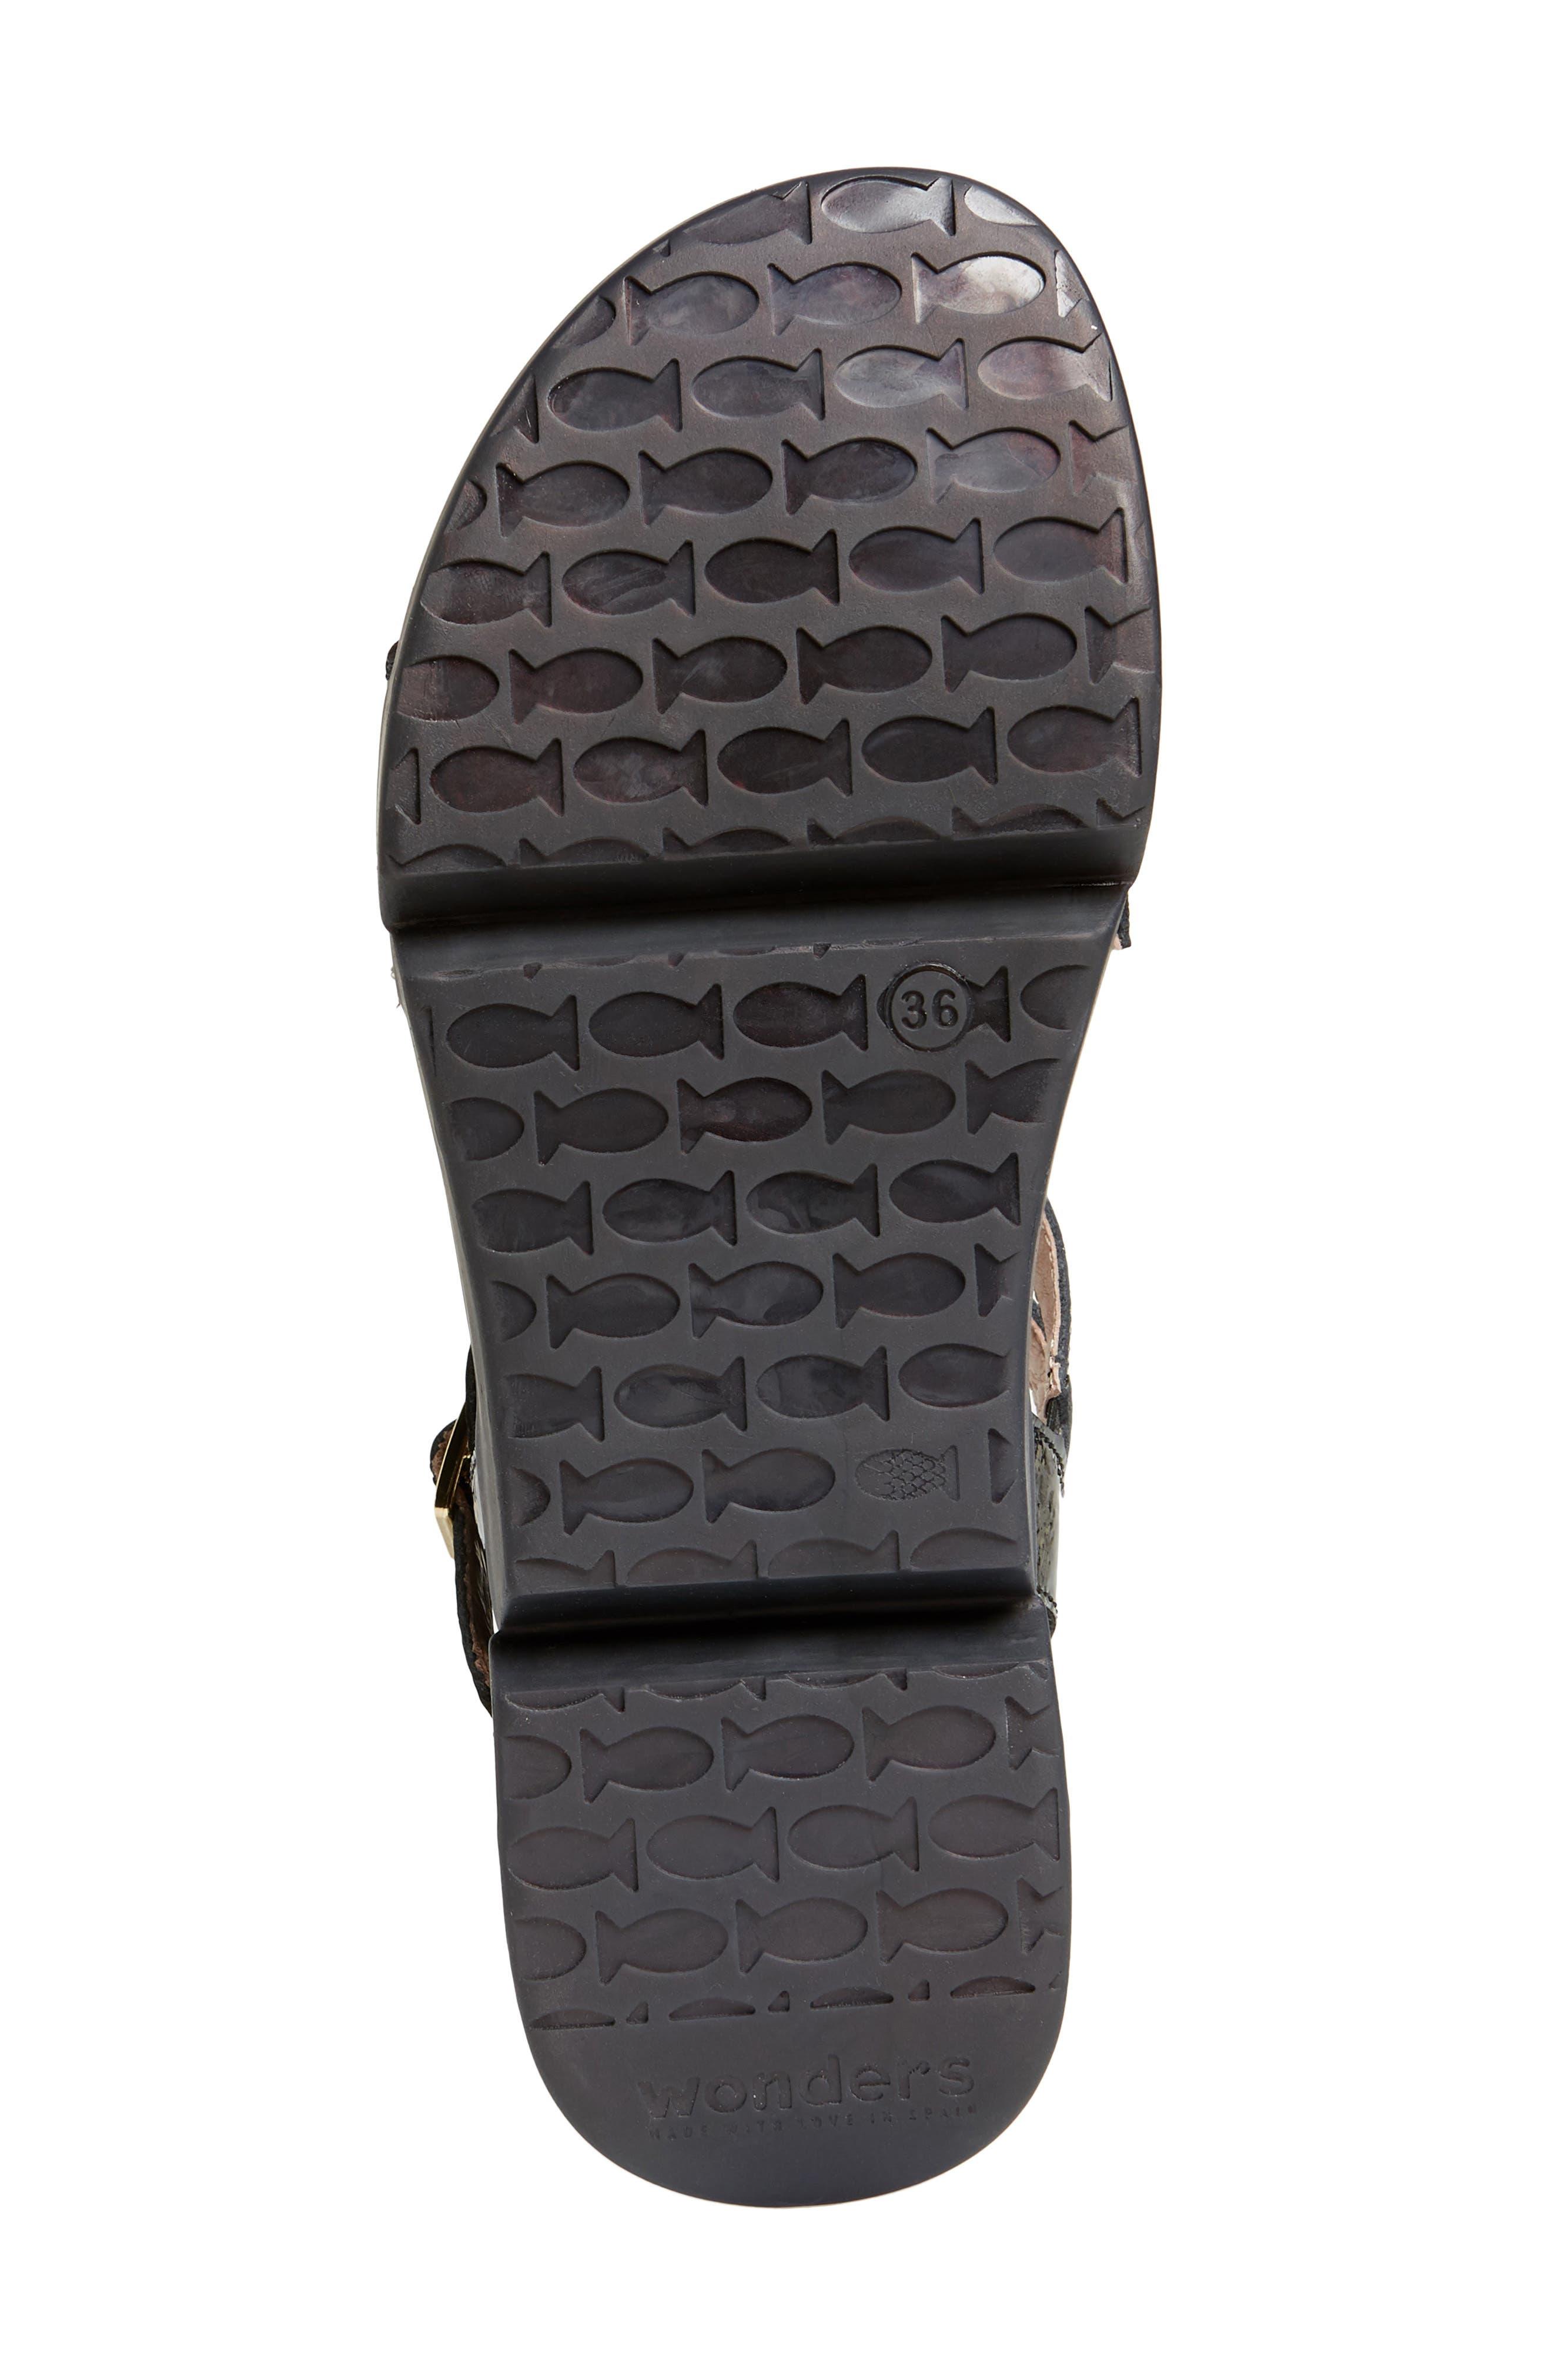 Wedge Sandal,                             Alternate thumbnail 6, color,                             BLACK PATENT LEATHER